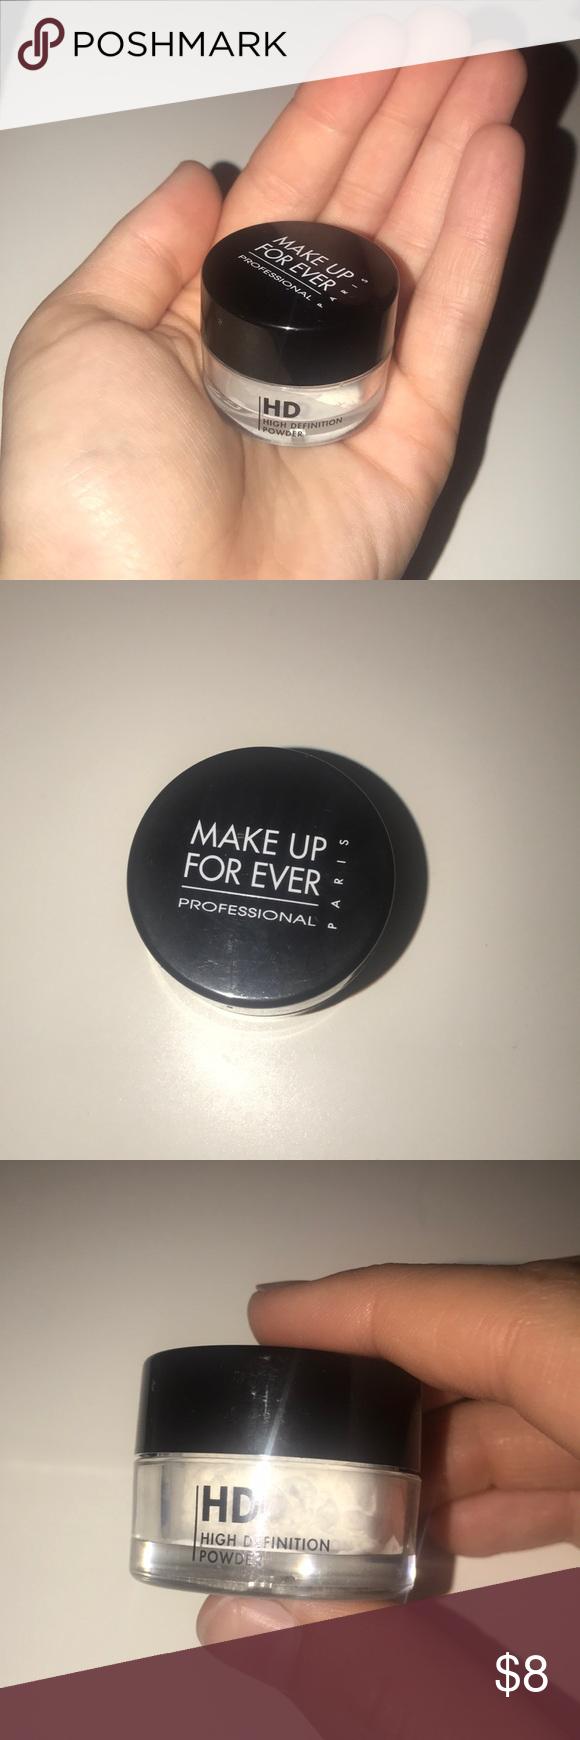 HD Setting Powder Mini New, unused Makeup Forever mini HD